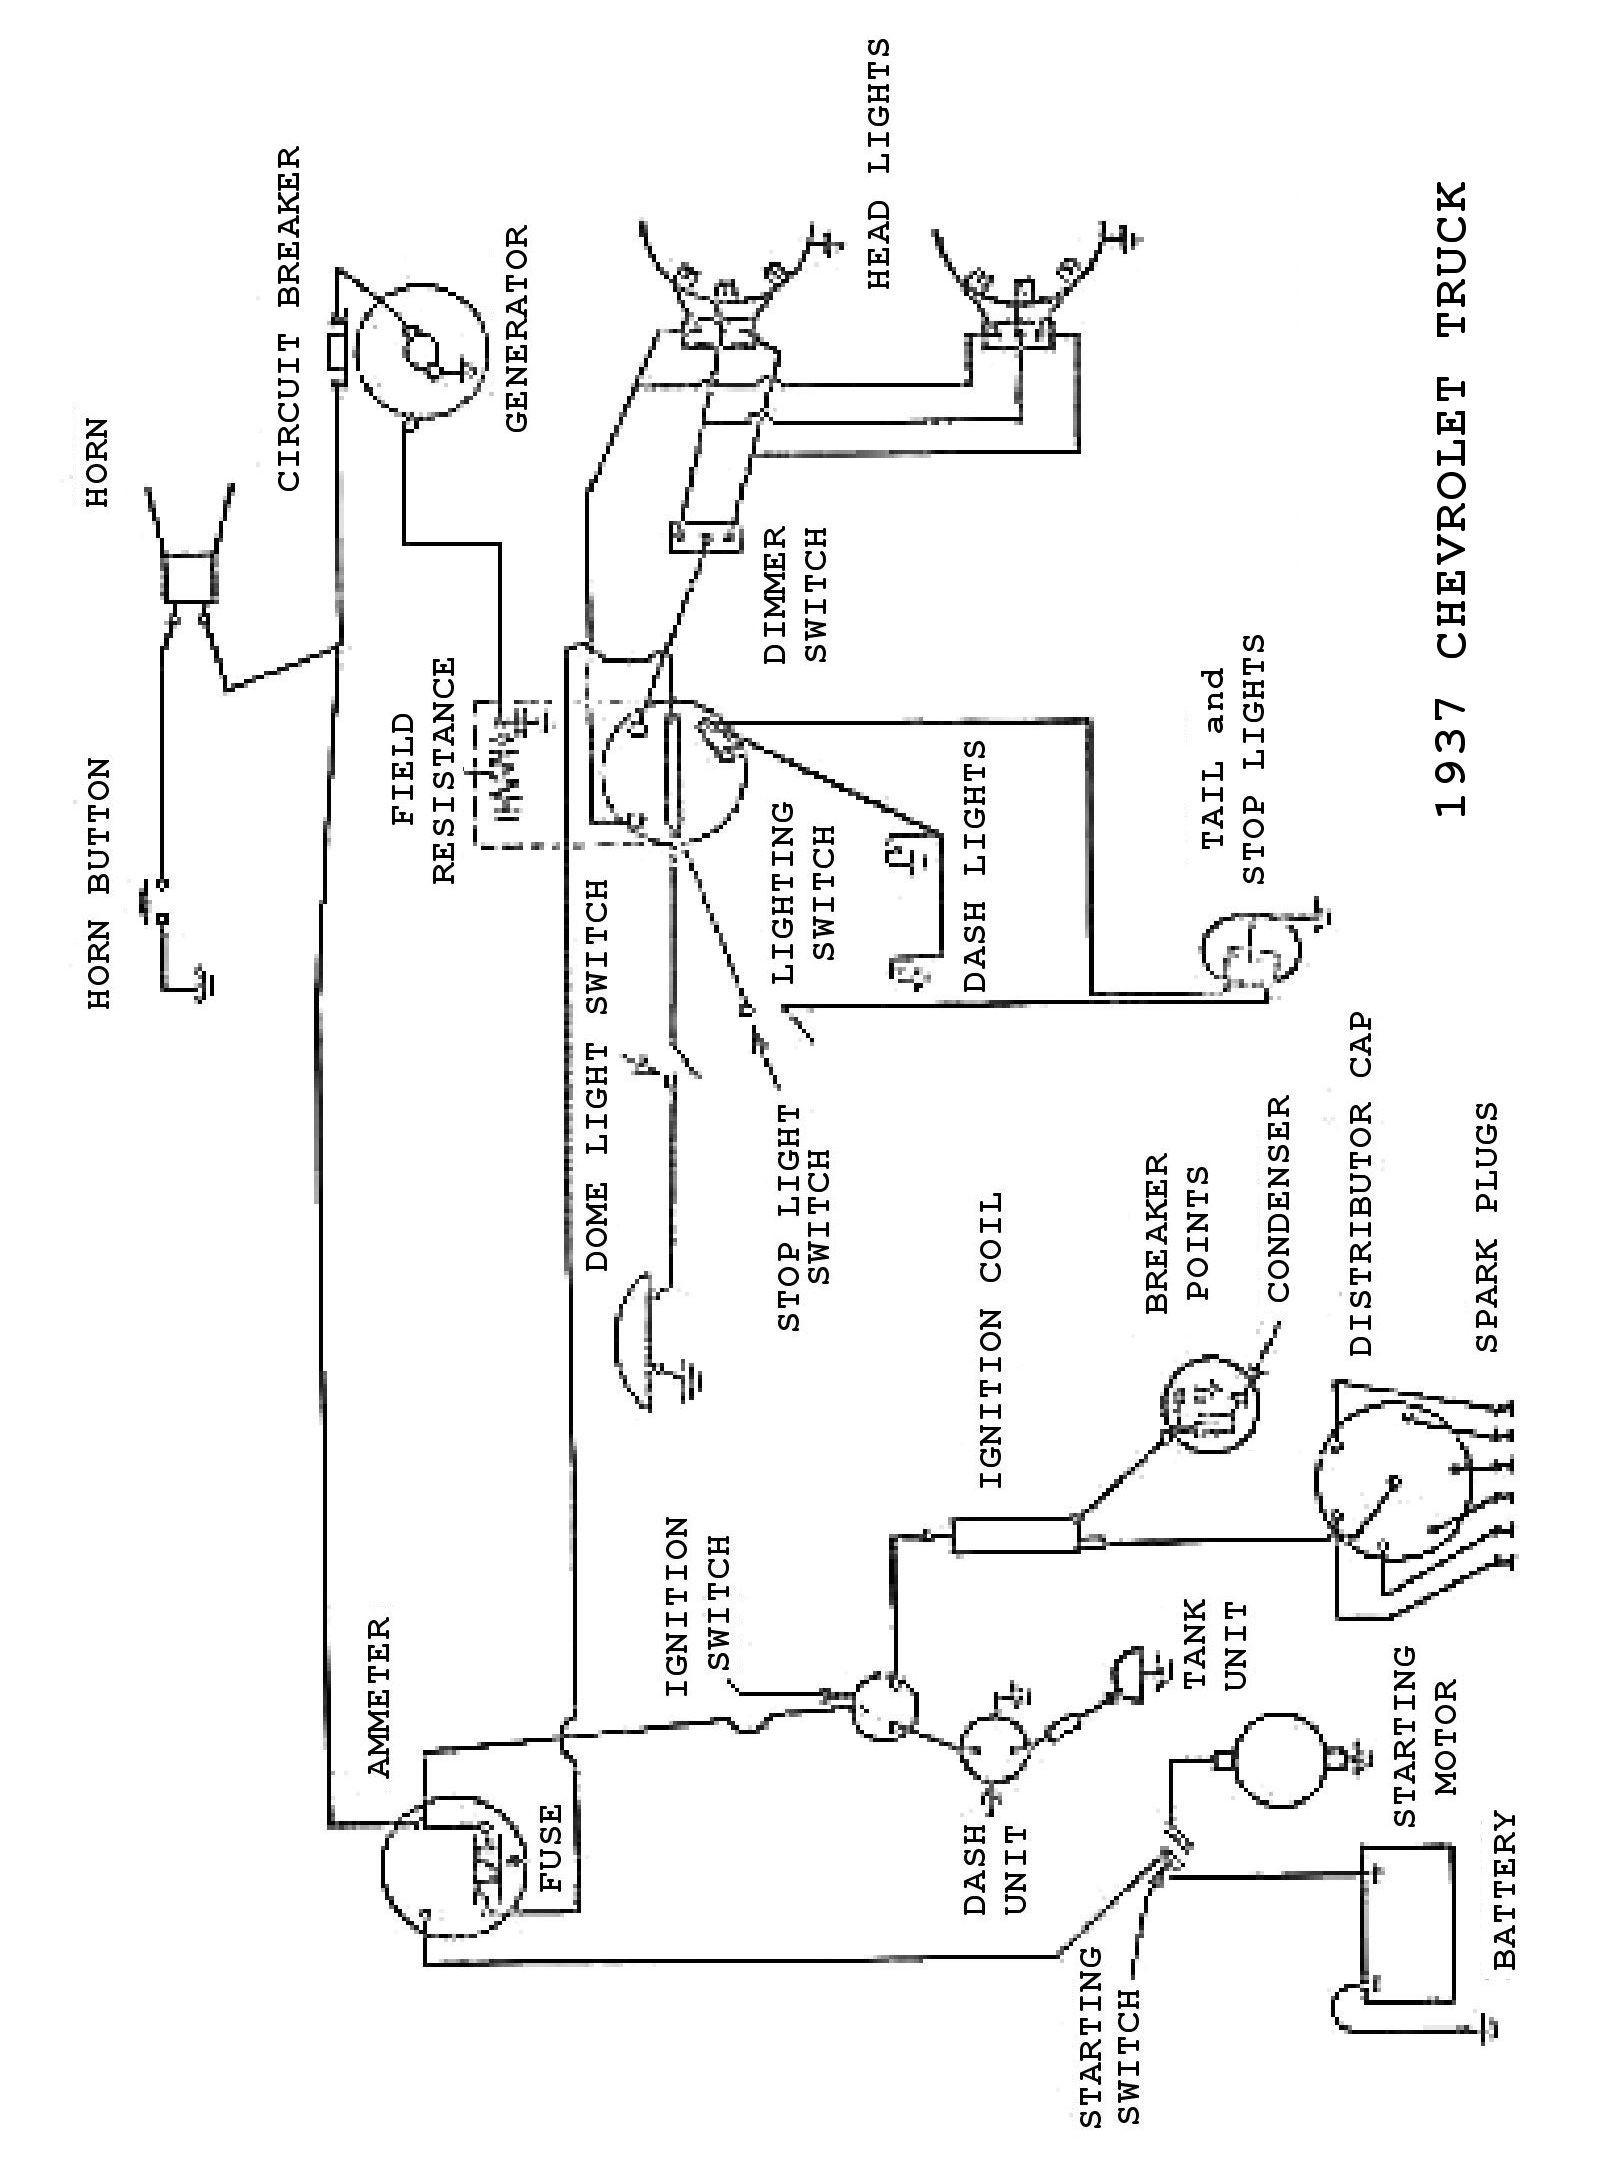 1998 chevy silverado brake light wiring diagram wiring diagrams of 1998 chevy silverado brake light wiring